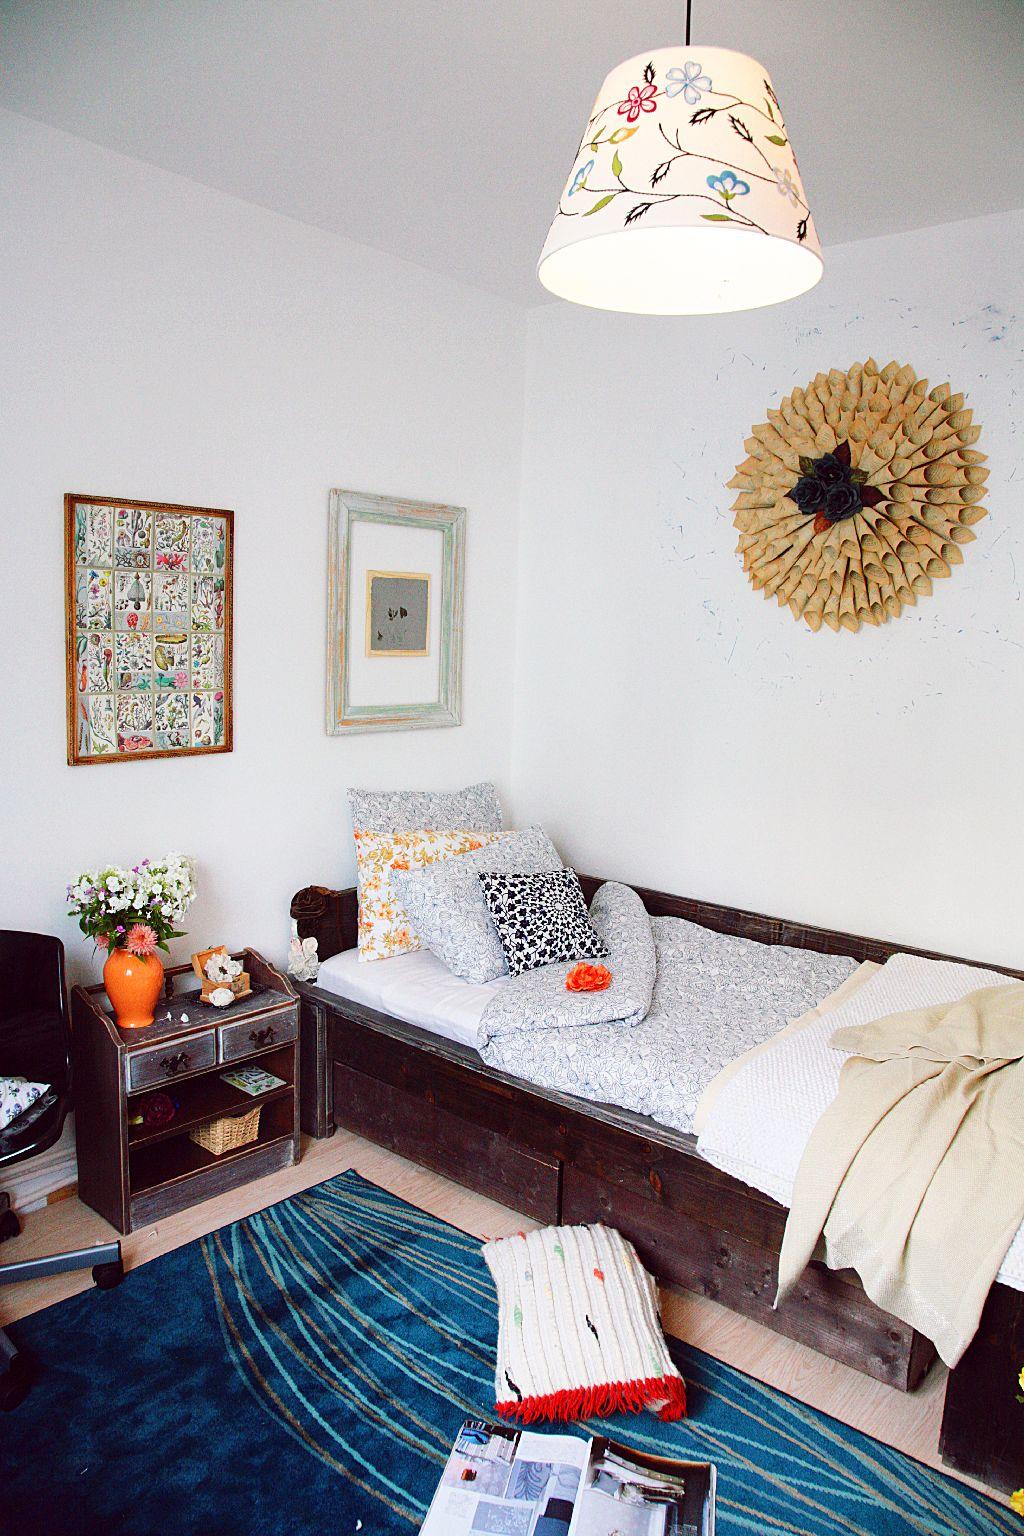 Decoratiunile conteaza in atmosfera camerei. Proiect amenajare Valdecor